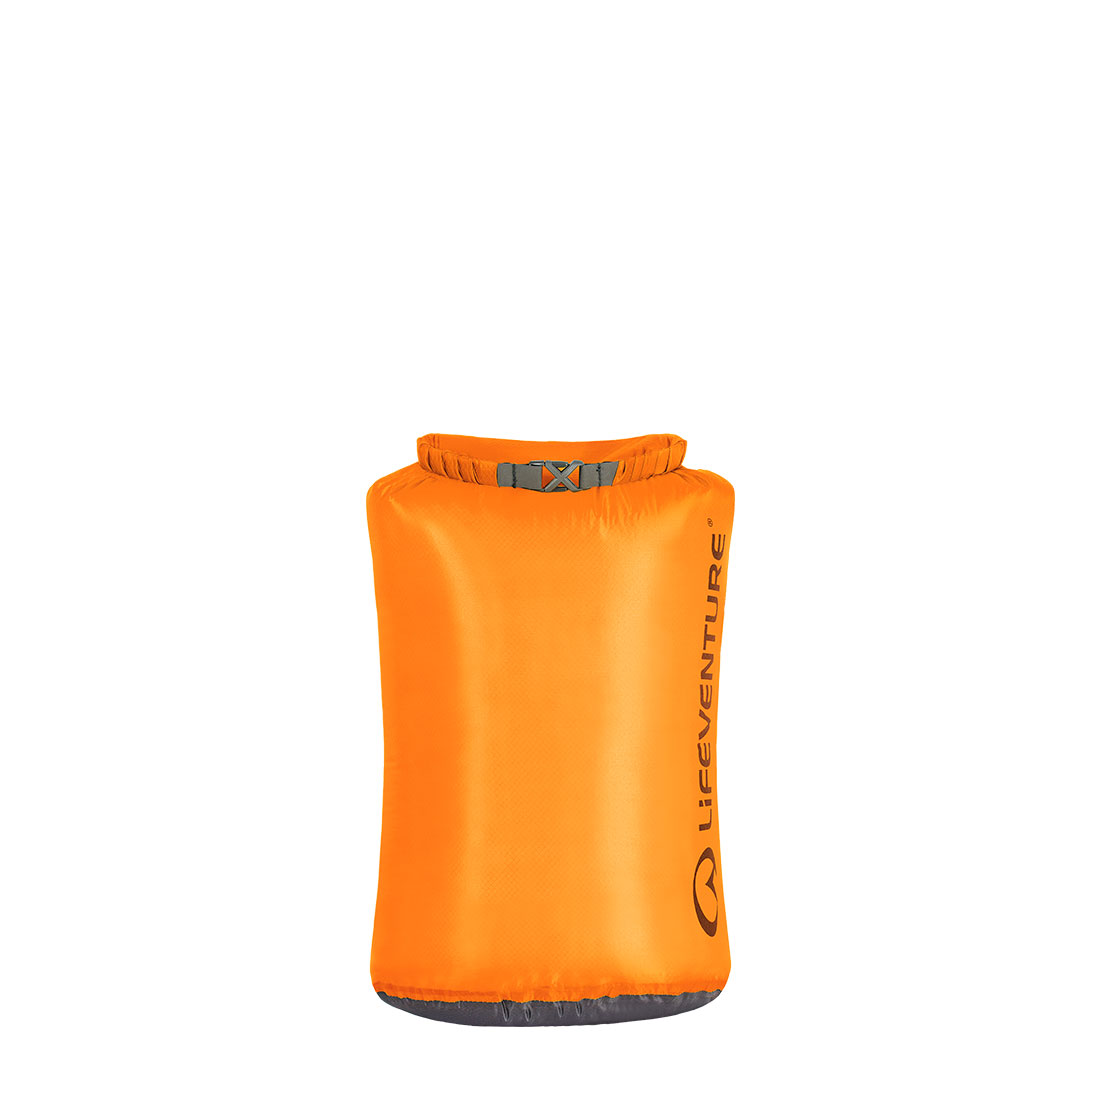 59640-ultralite-dry-bag-15l-1